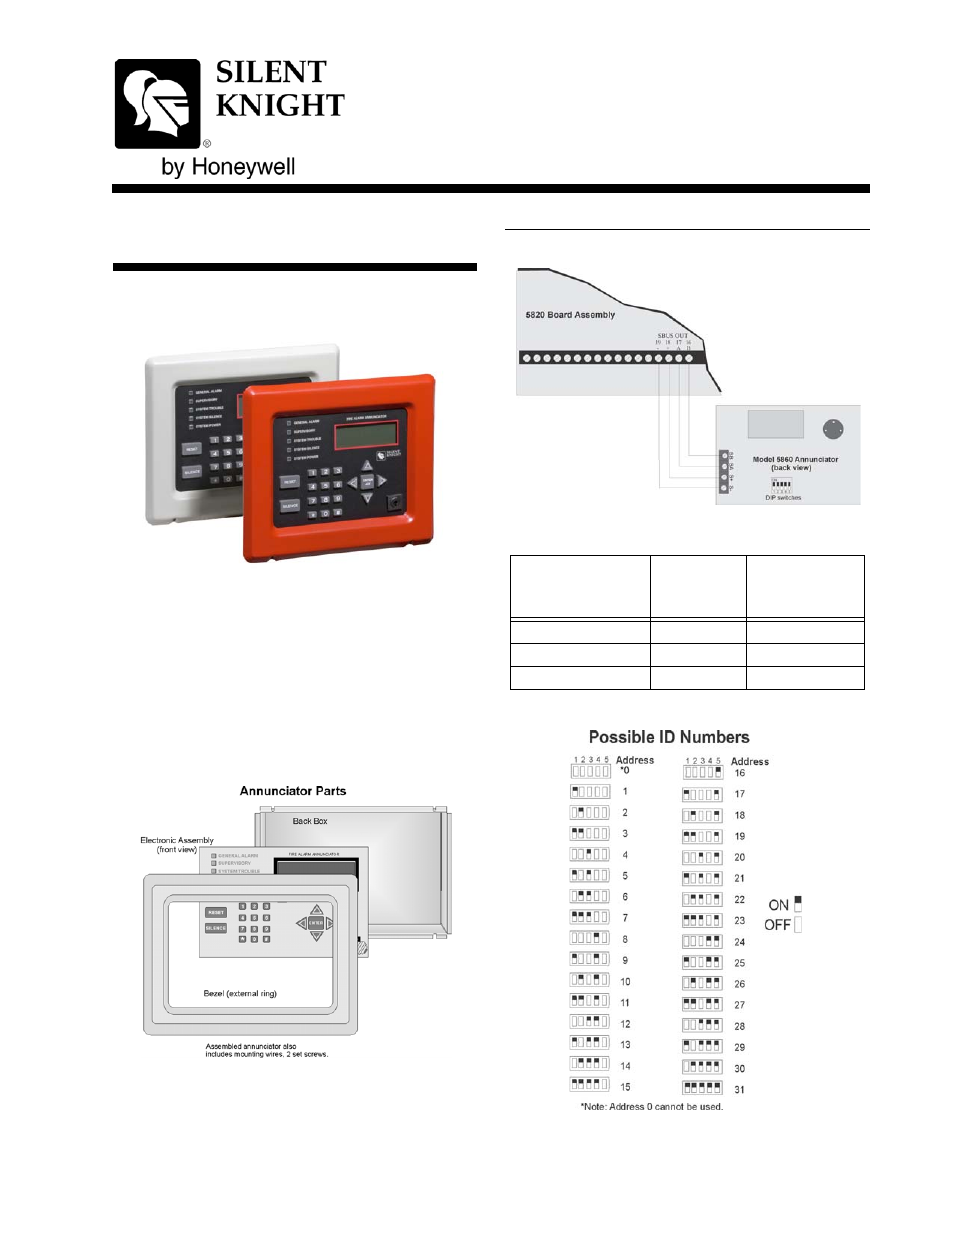 Silentknight 5860 5860r Remote Annunciator User Manual 2